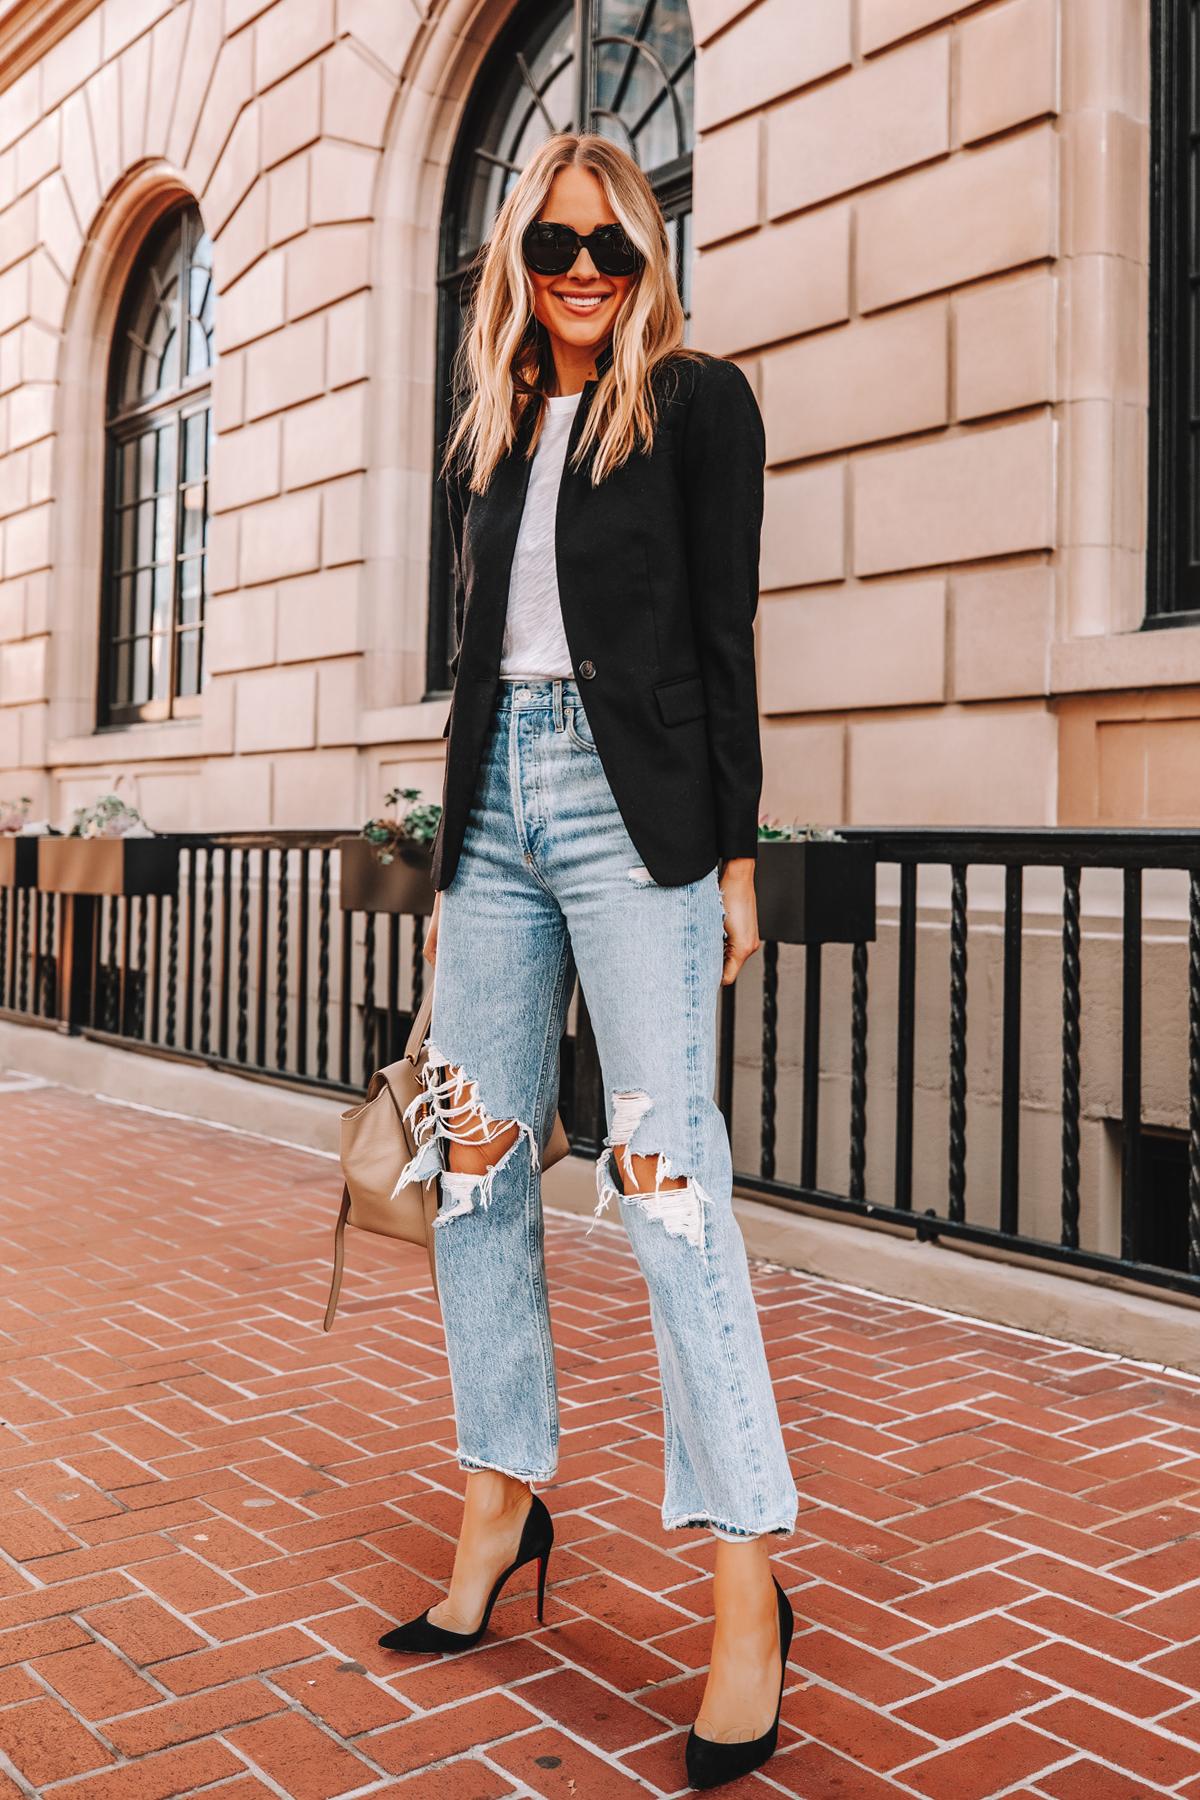 Fashion Jackson Wearing Jcrew Regent Black Blazer ATM White Tshirt AGOLDE Ripped Jeans Black Pumps 1